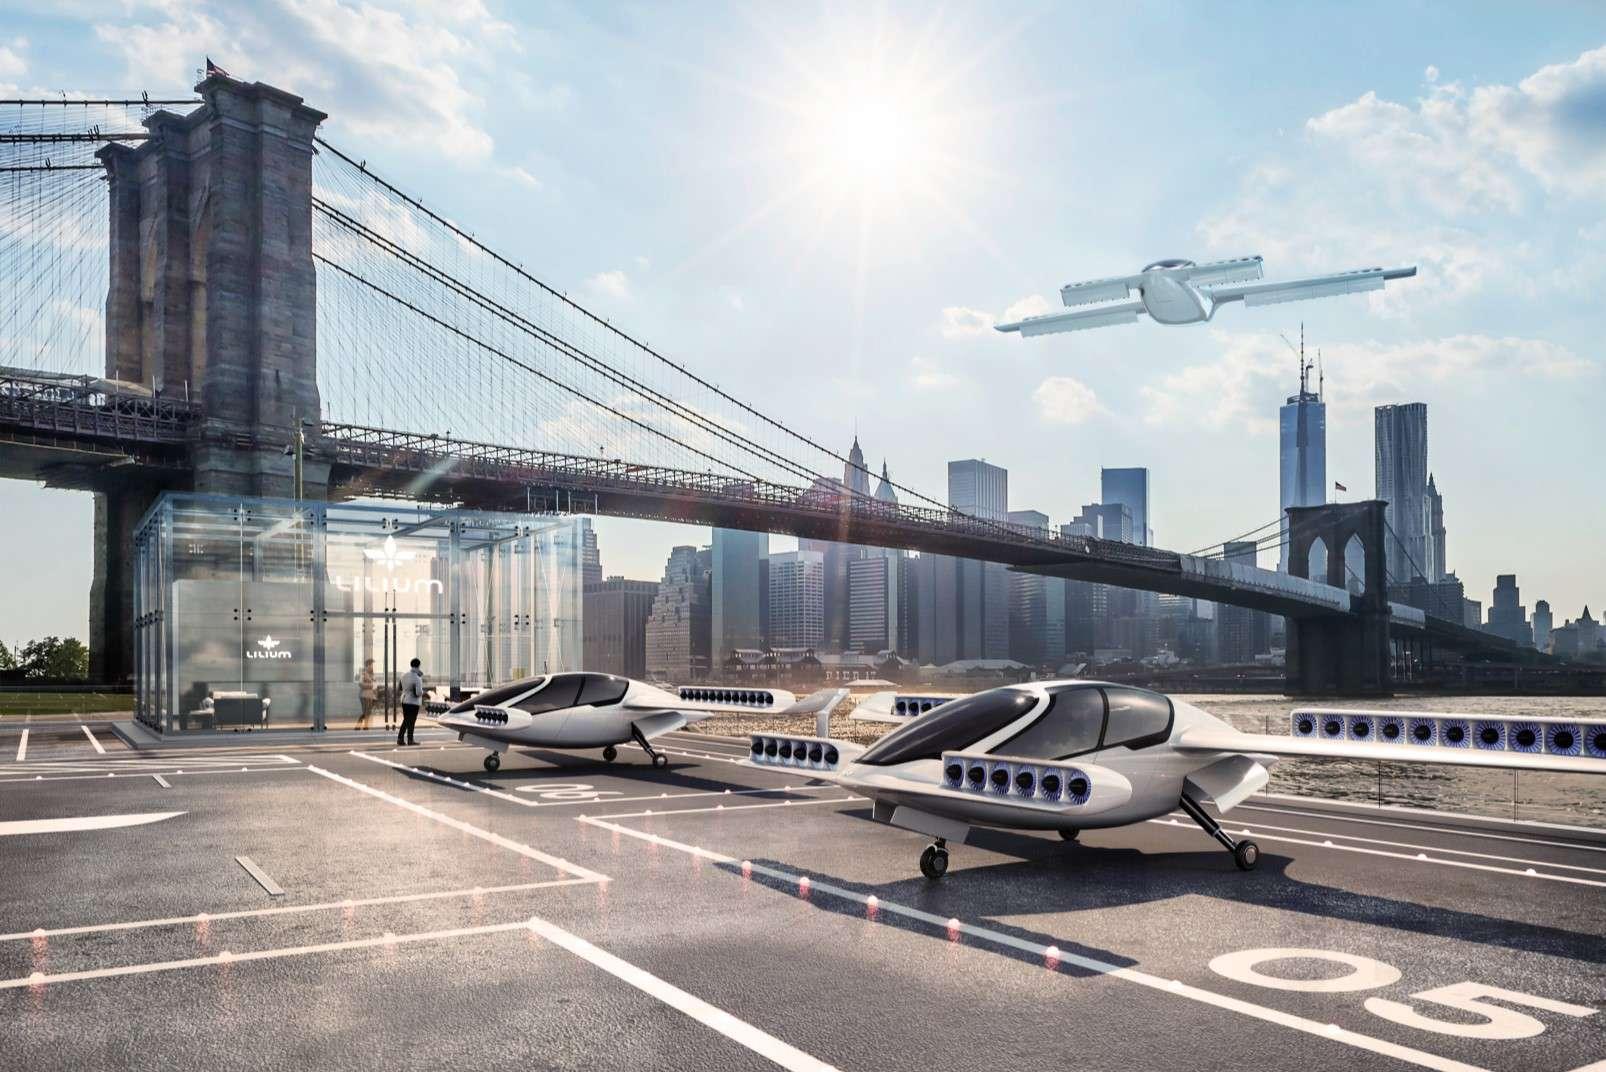 Lilium passenger-carrying drone landing-pad pier